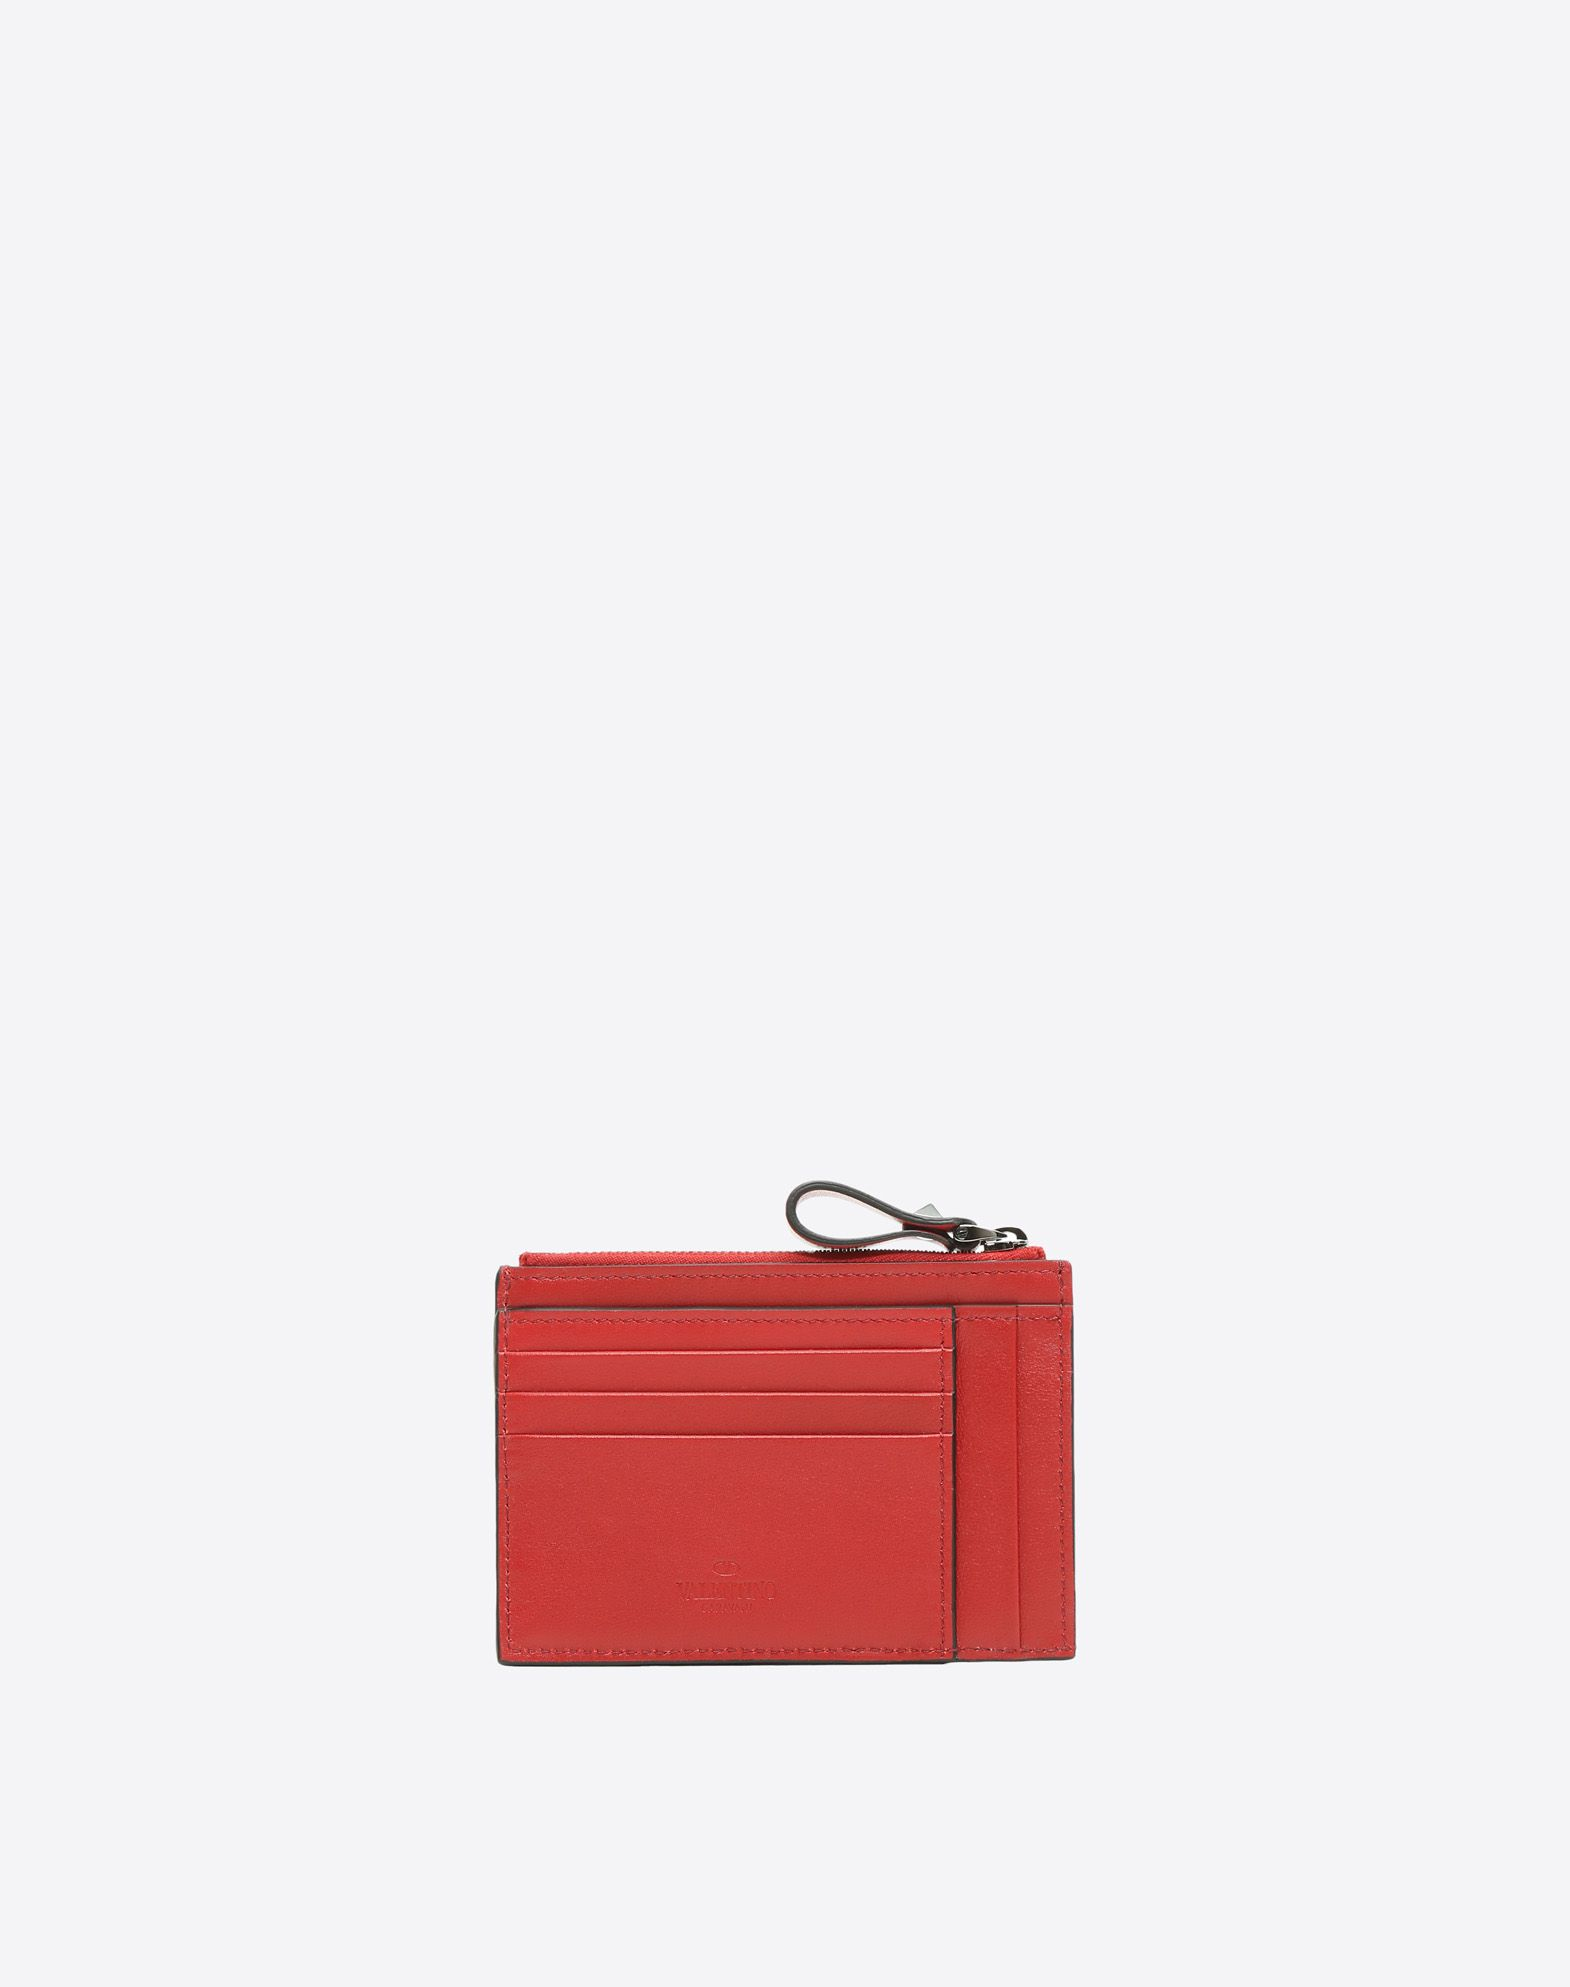 porte cartes porte monnaie rockstud valentino garavani uomo pour homme valentino boutique en ligne. Black Bedroom Furniture Sets. Home Design Ideas